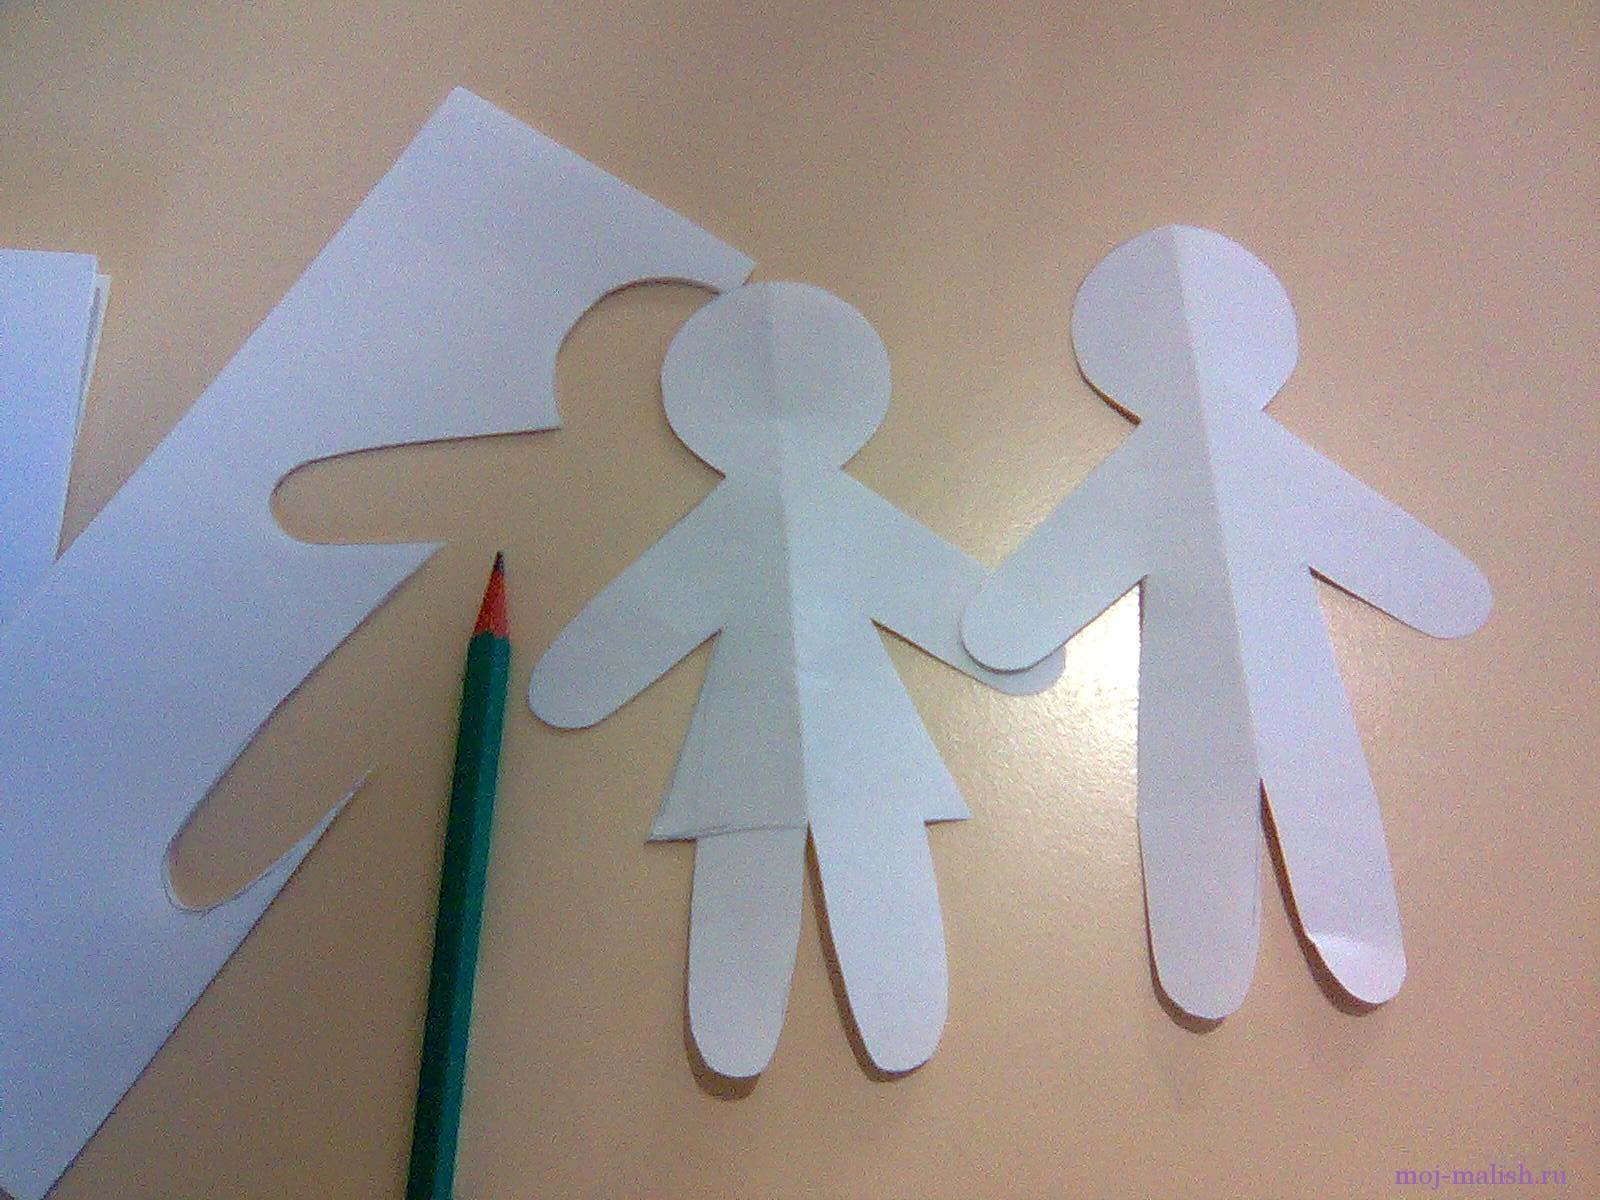 Человечки из бумаги своими руками фото